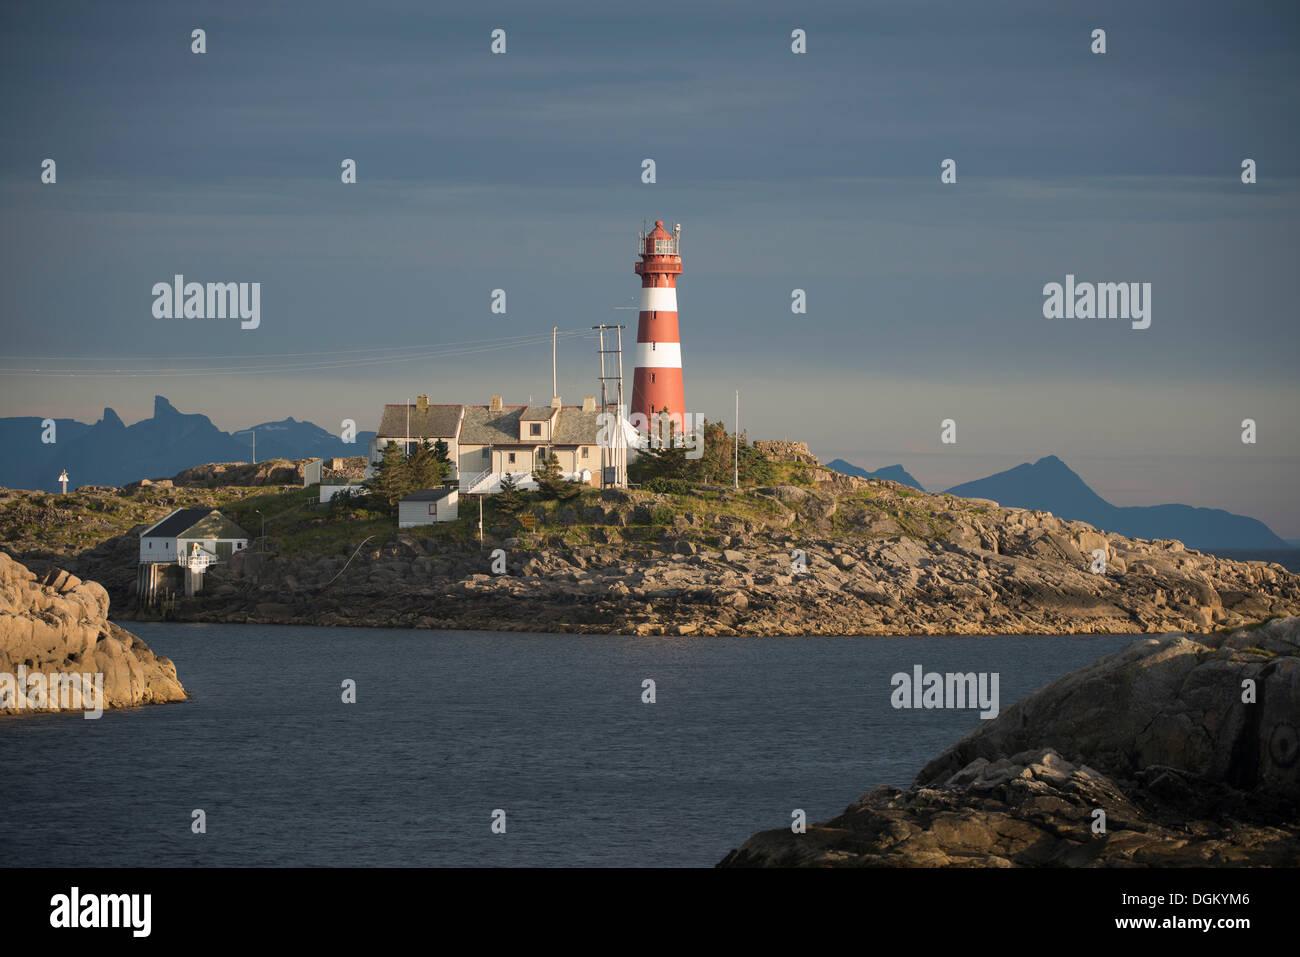 Phare et bâtiments dans la lumière du soir, Ort und Inselgruppe Skrova, Gemeinde, Vågan Inselgruppe, Lofoten, Nordland Photo Stock